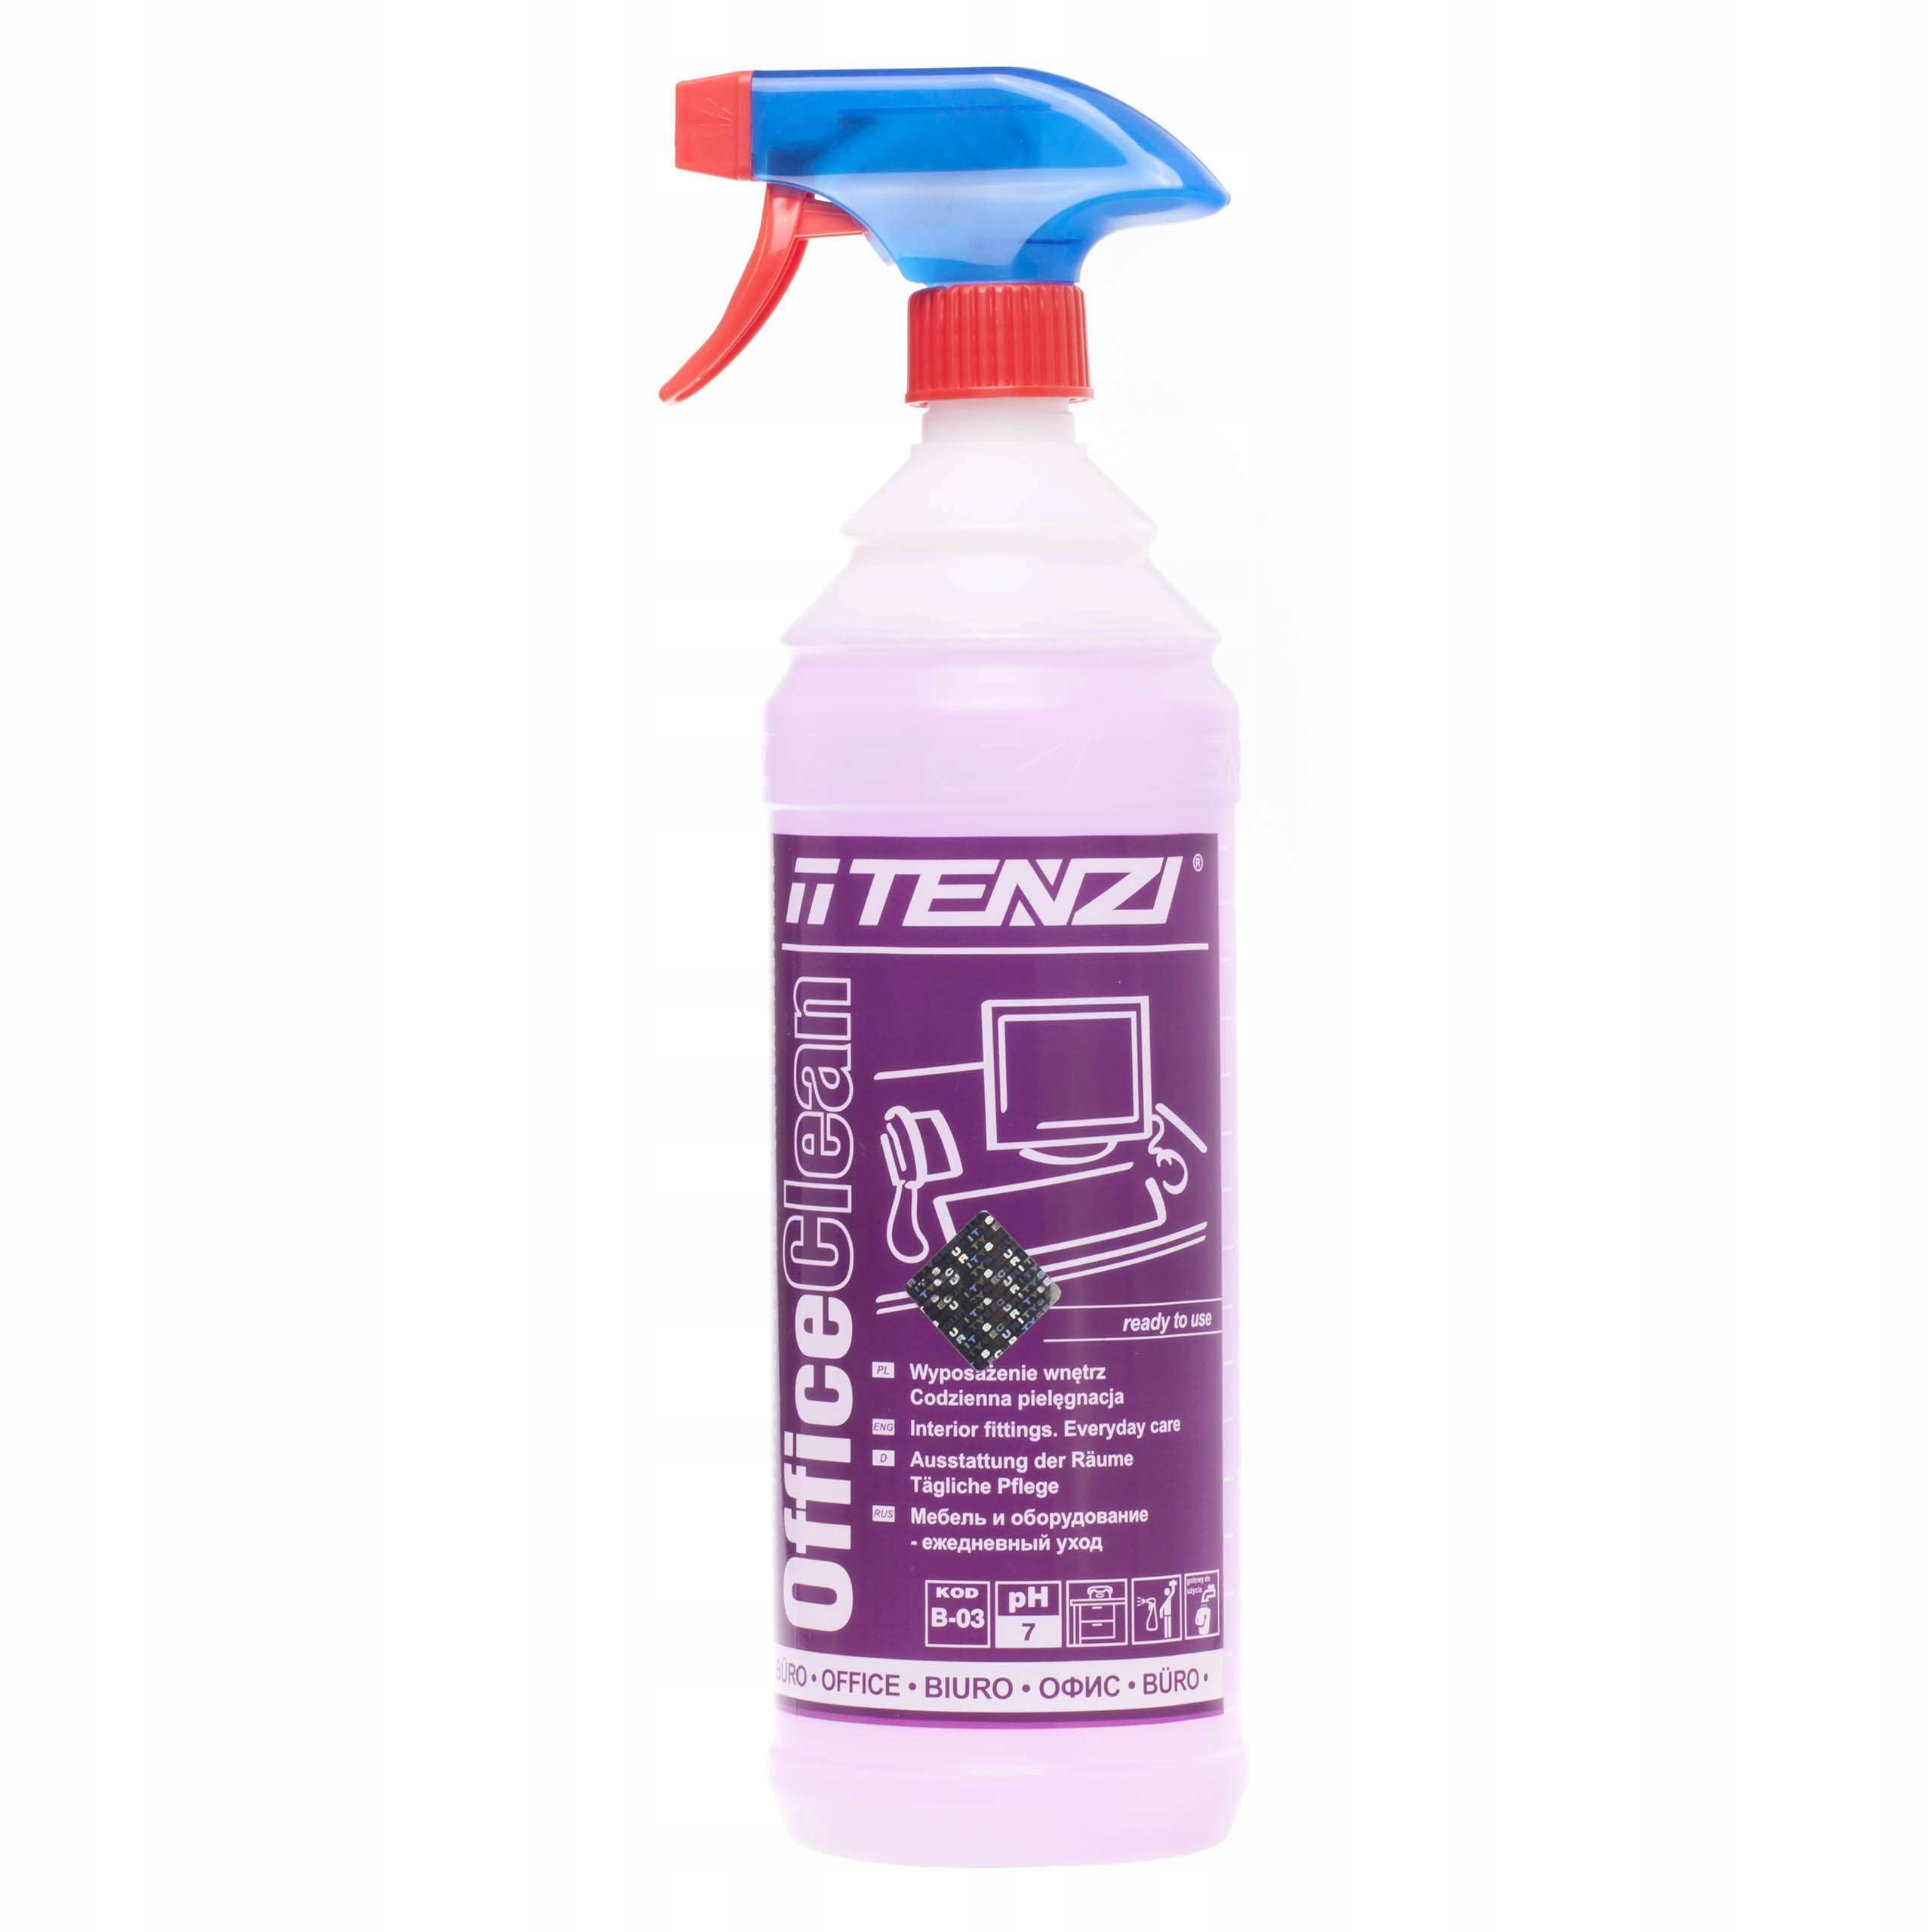 Tenzi Office Clean Моющее средство для чистки мебели 1л